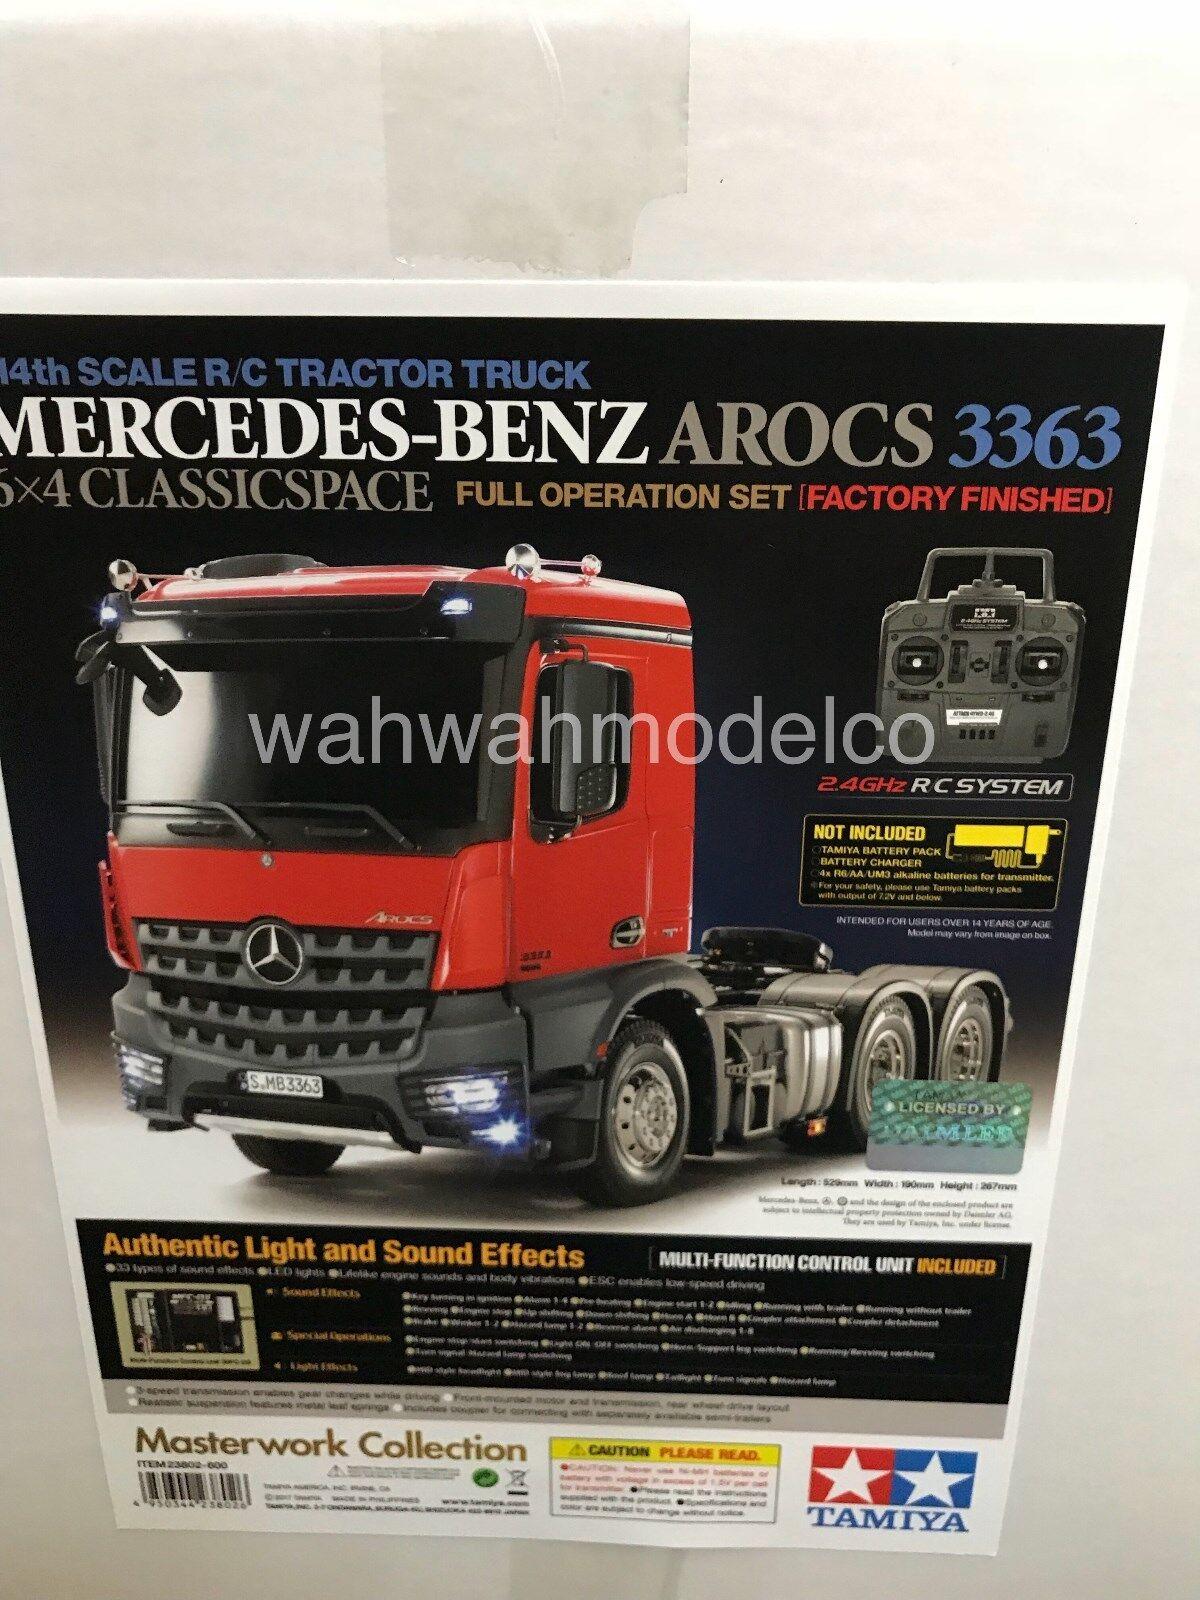 Tamiya a 1 14 Mercedes-Benz Arocs 3363 6x4 classicspace Rtr Listo